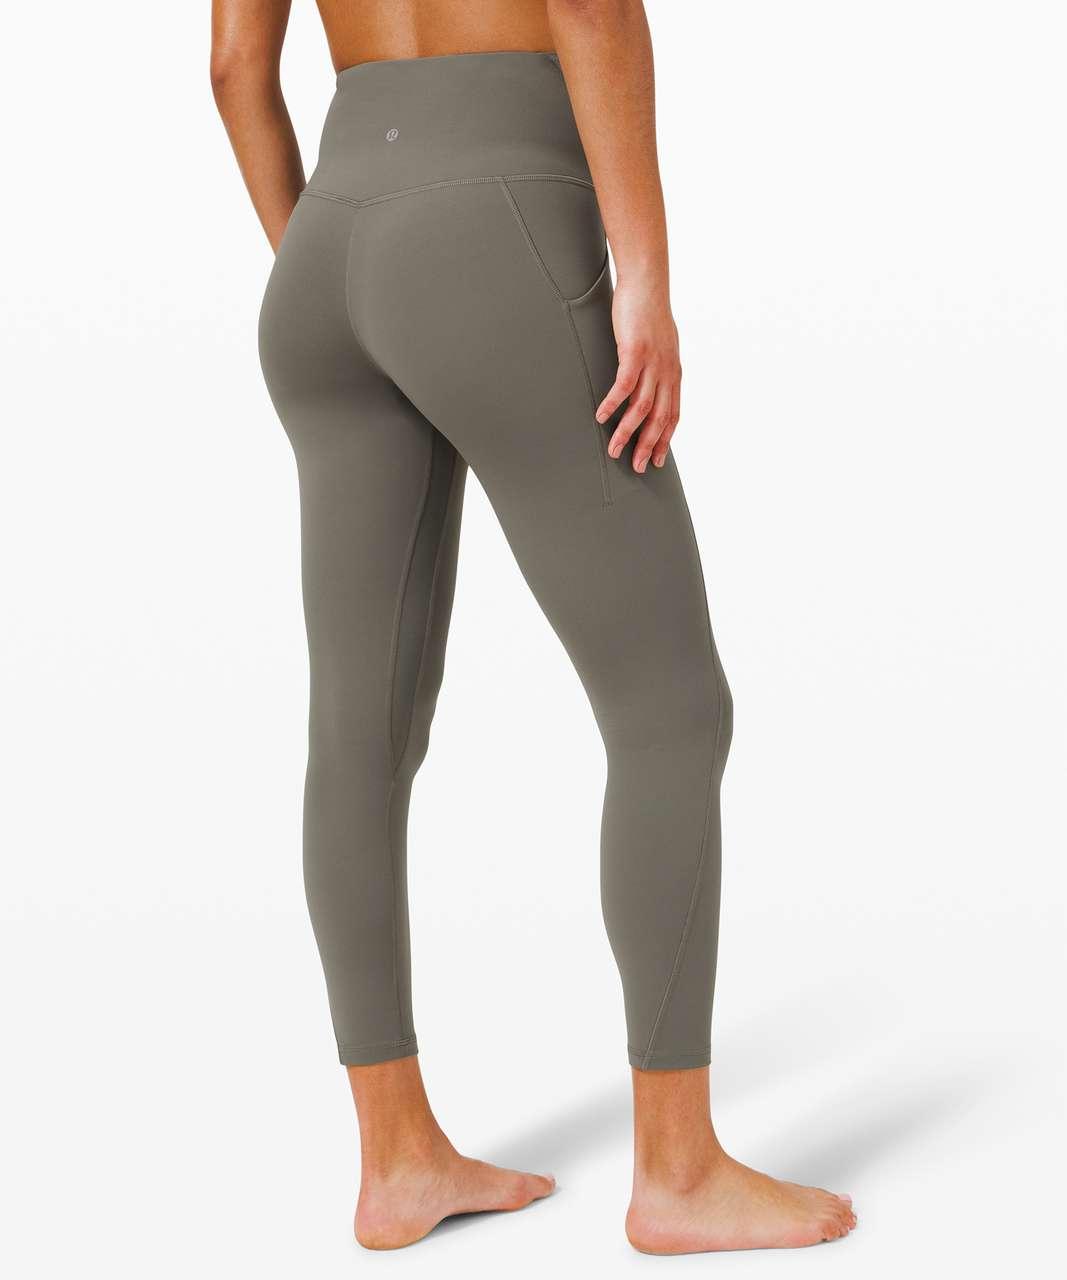 "Lululemon Align High Rise Pant with Pockets 25"" - Grey Sage"